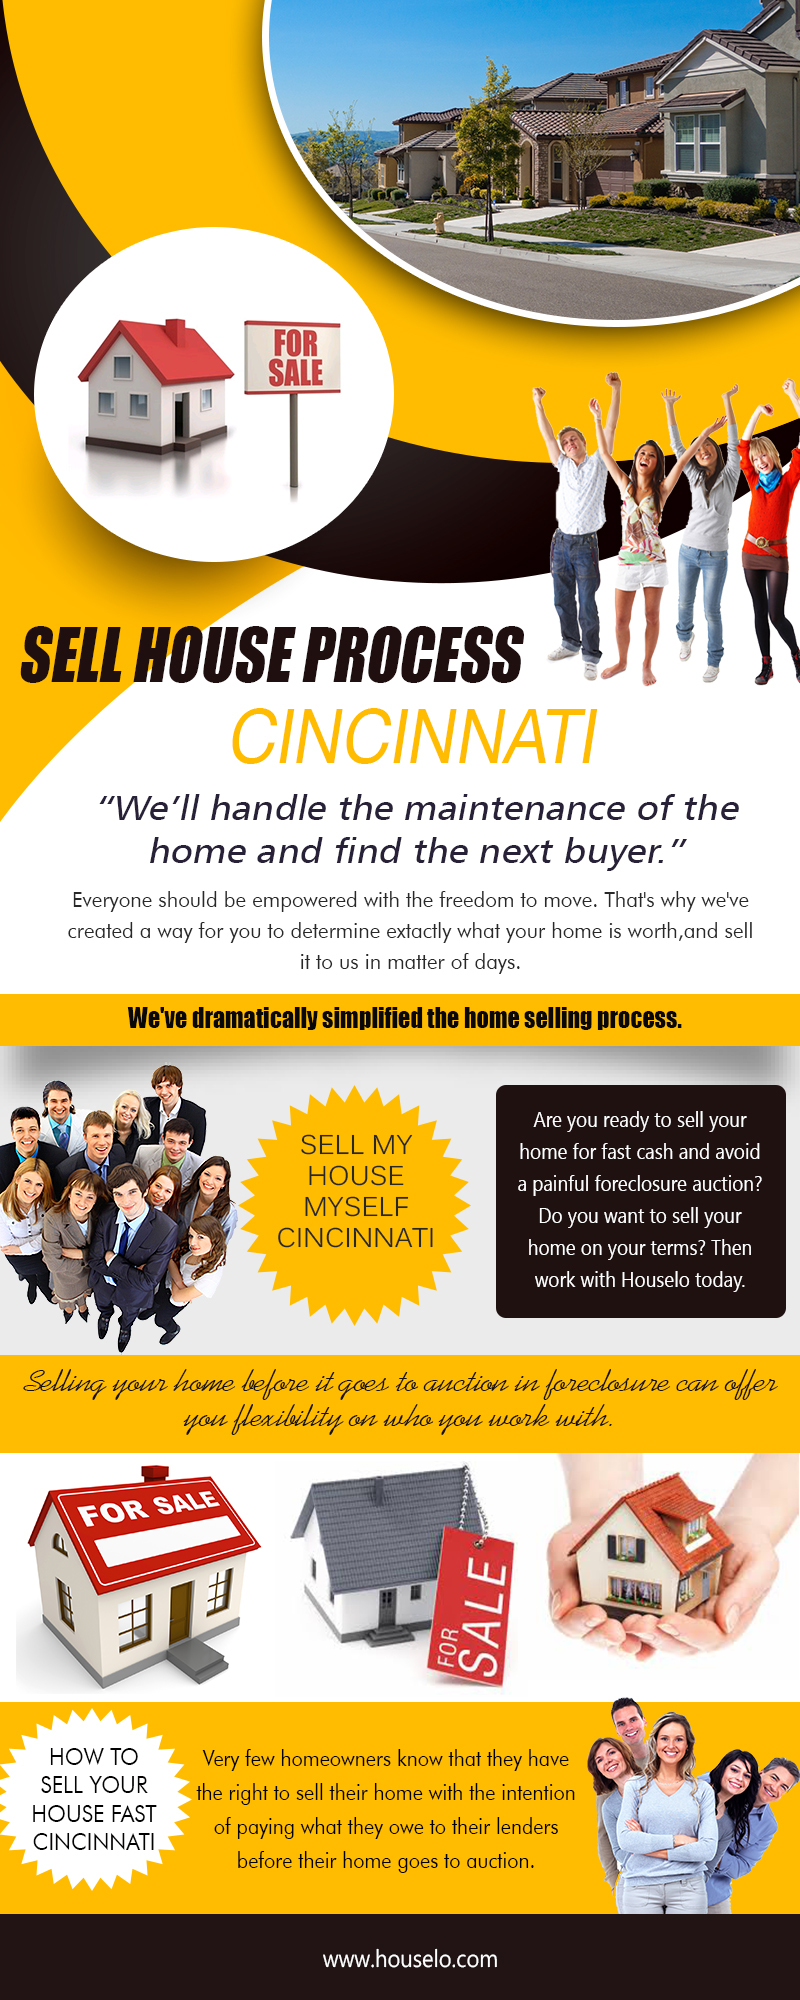 Sell House Process Cincinnati